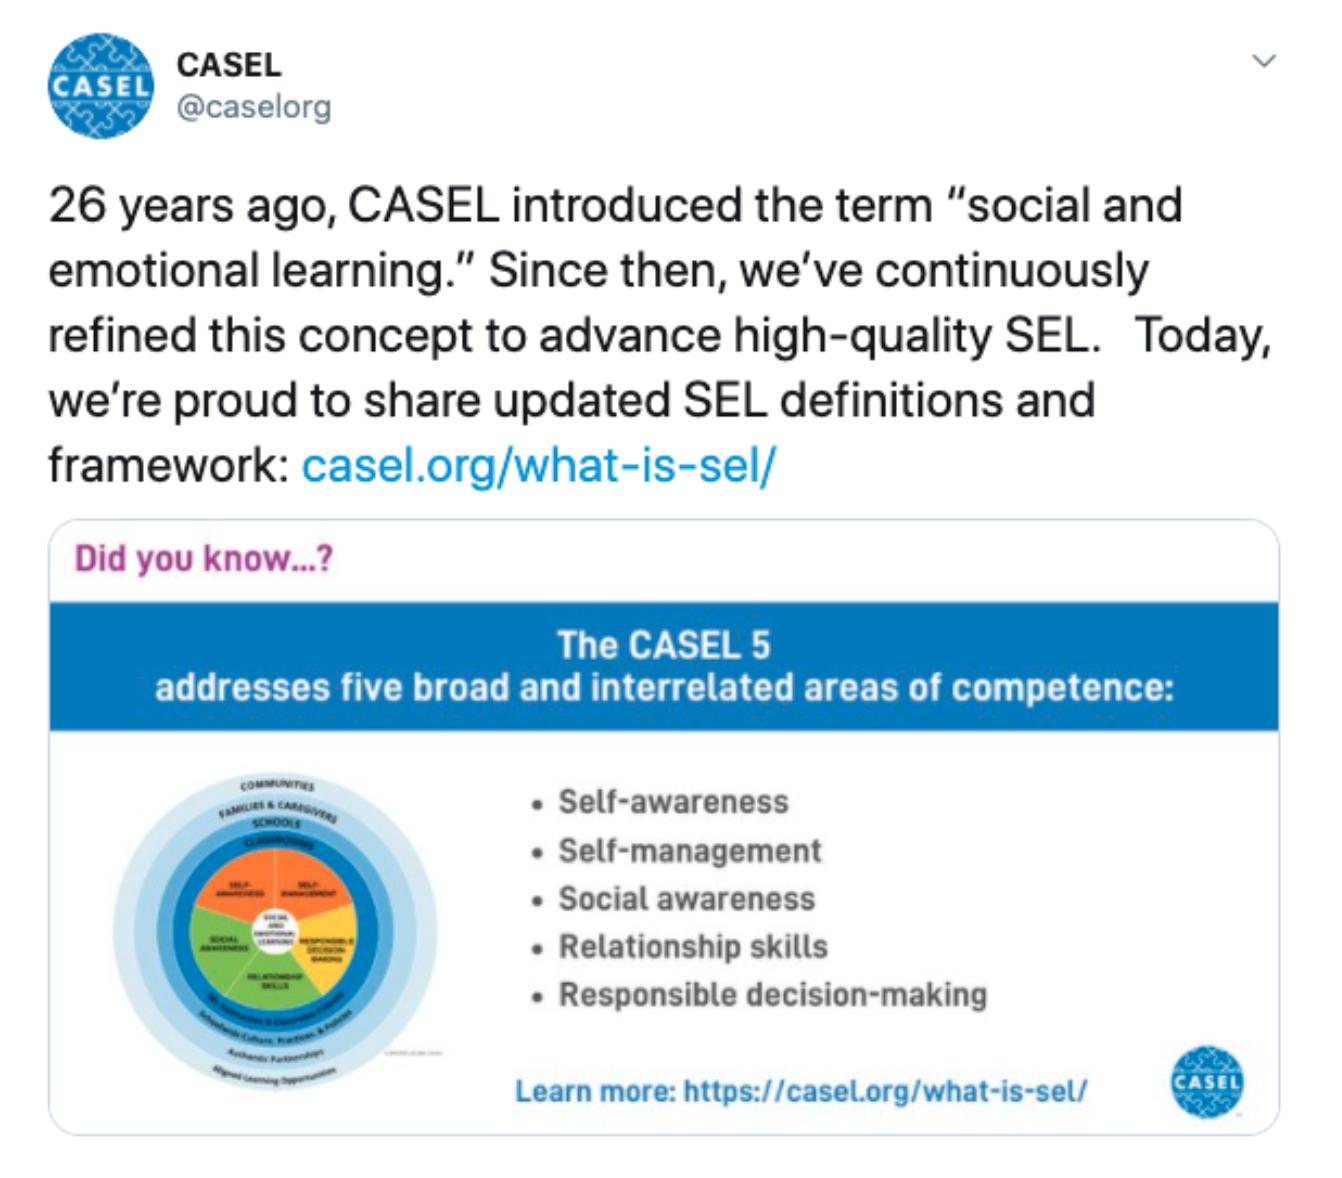 CASEL's SEL definition update